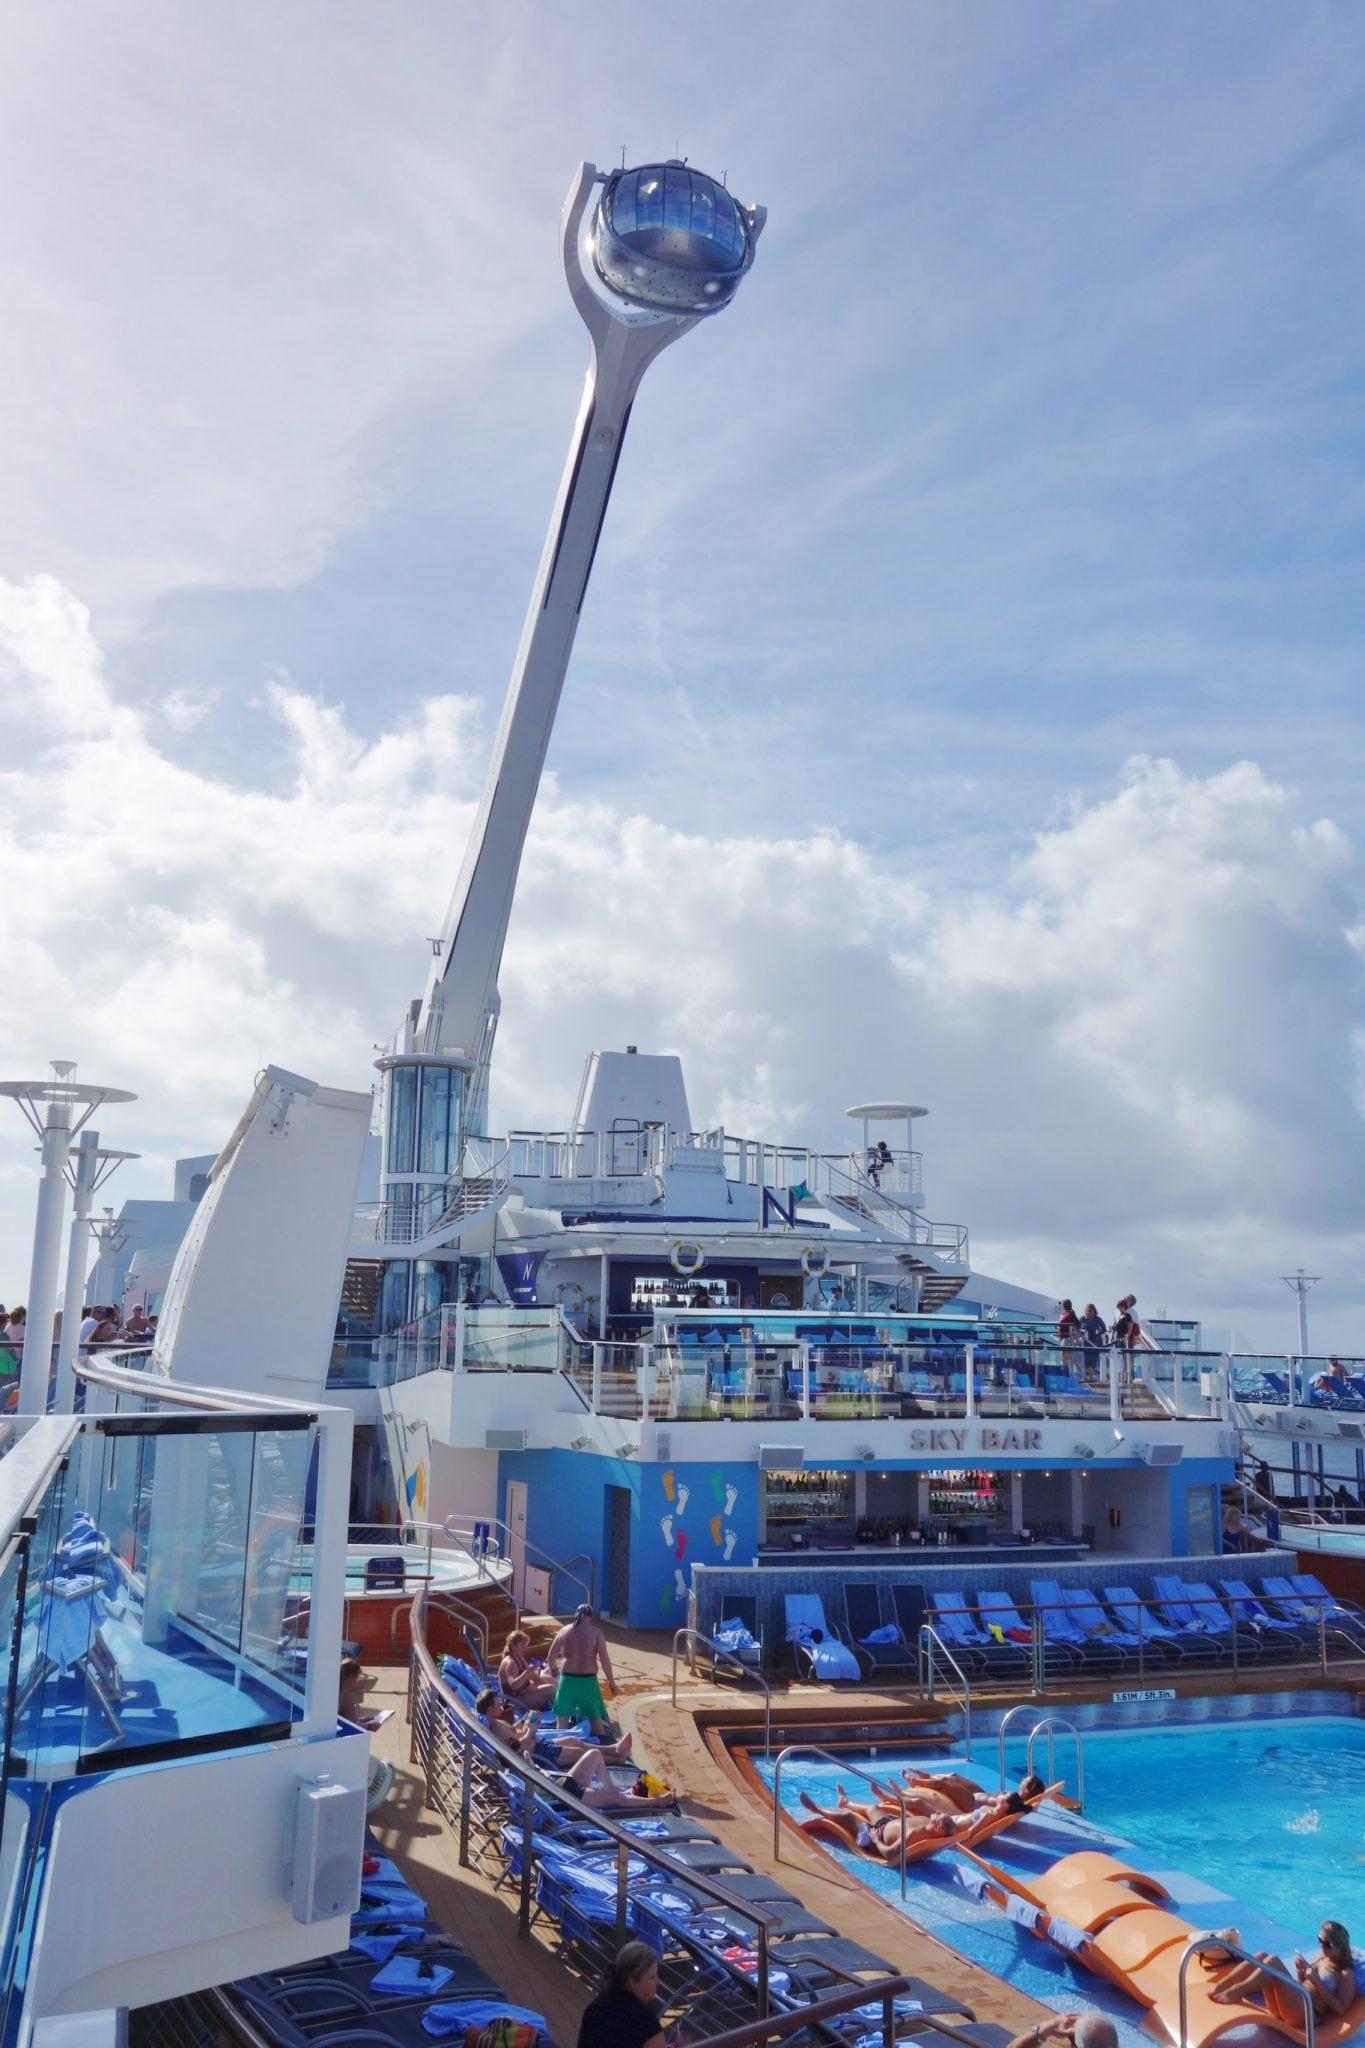 Royal Caribbean North Star